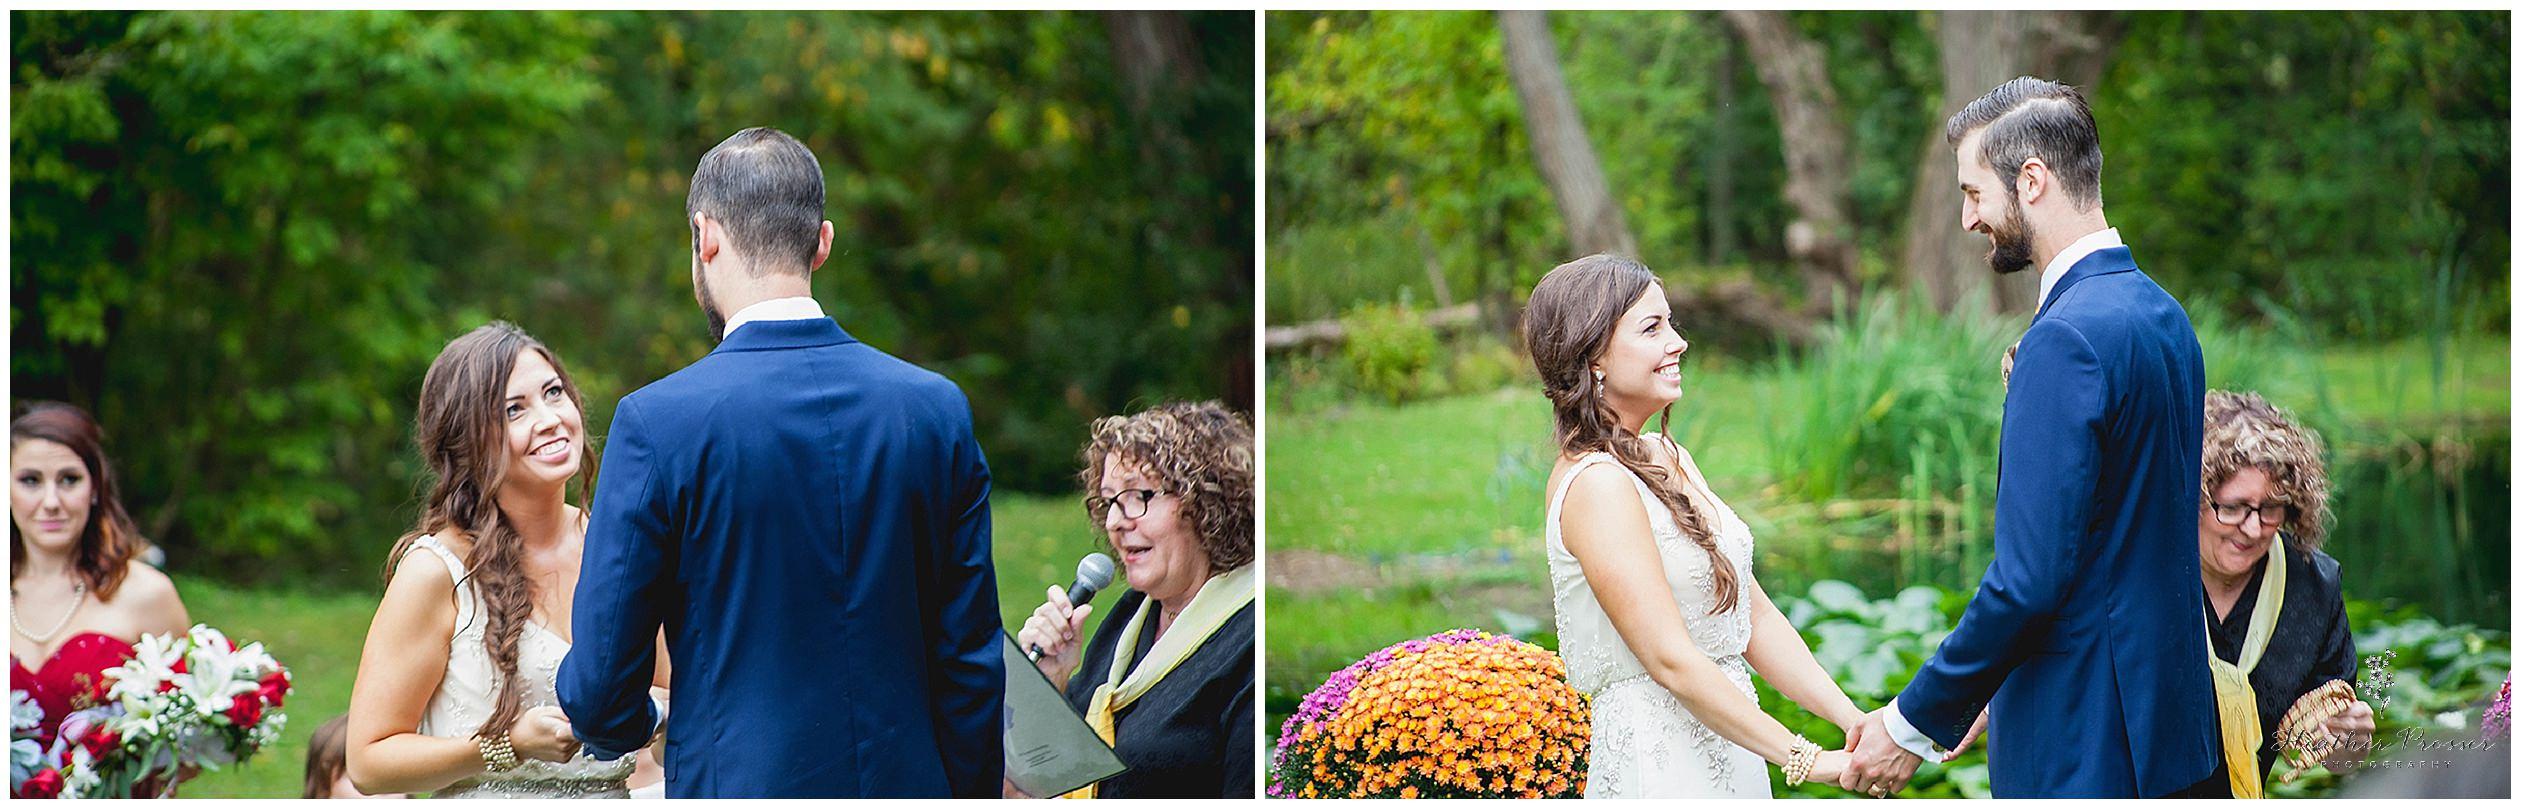 Bowmanville Wedding Photography_0194.jpg